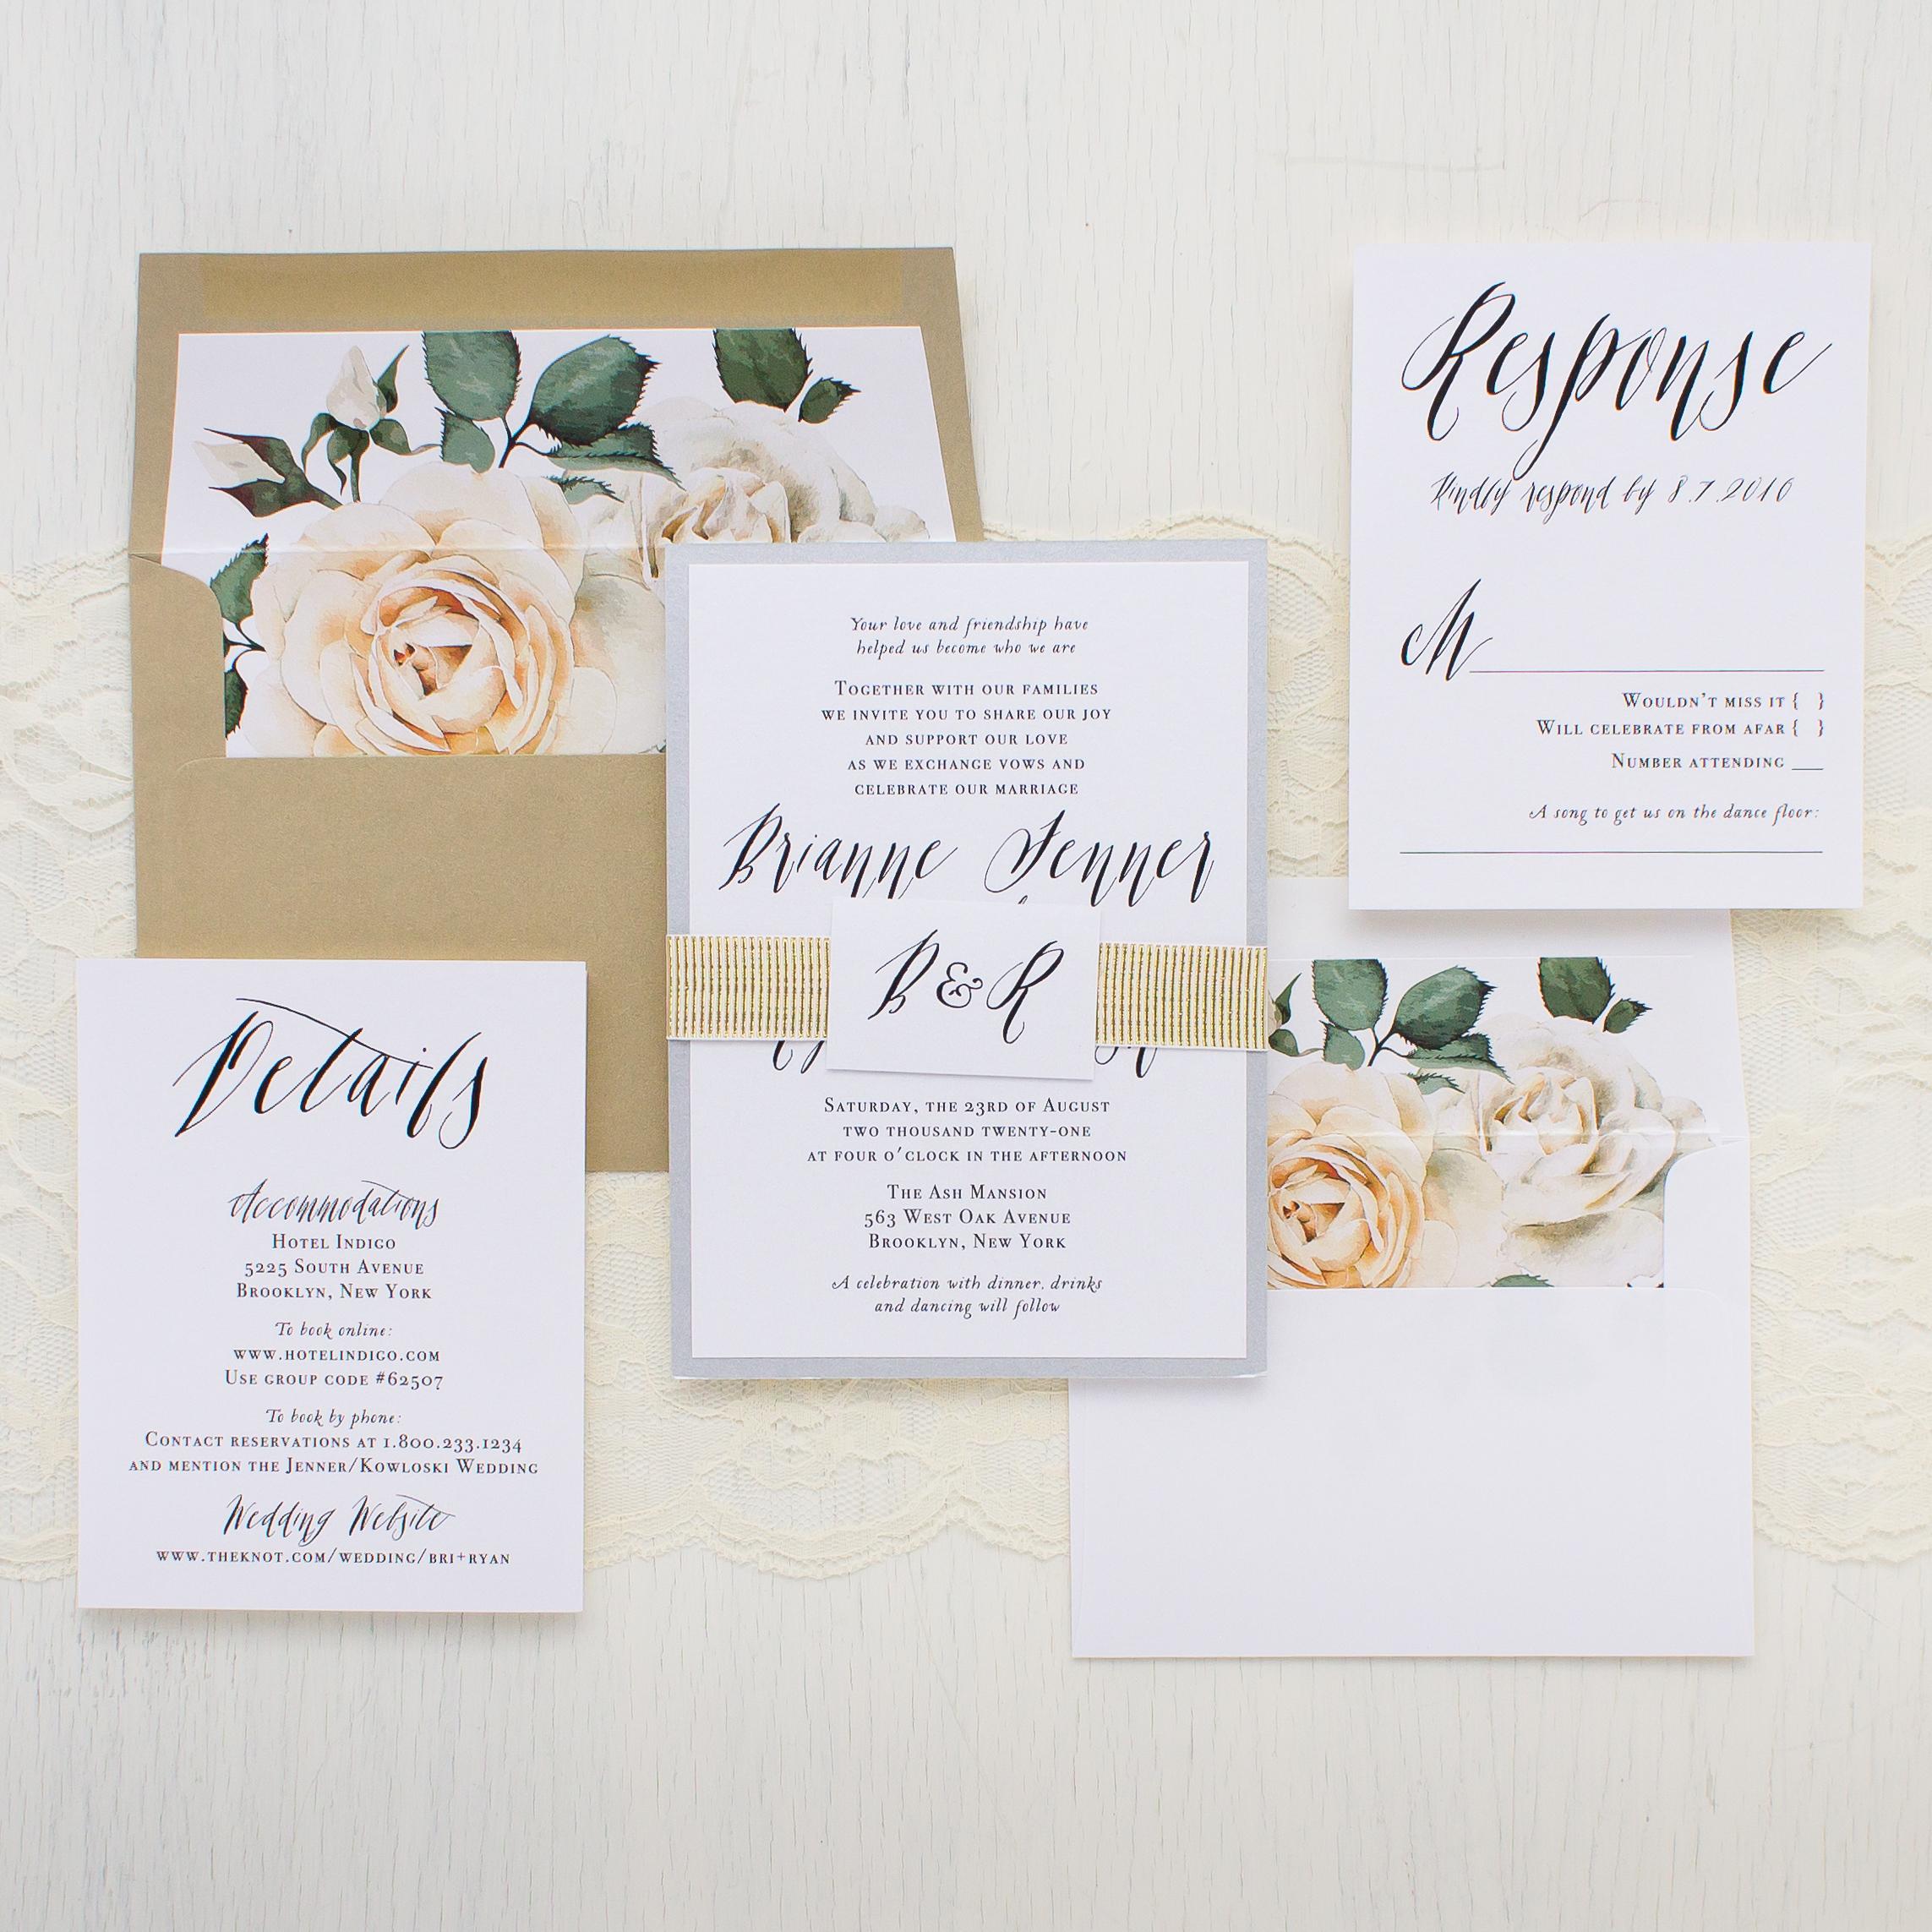 Matching Wedding Day Stationery: Modern Calligraphy | Beacon Lane